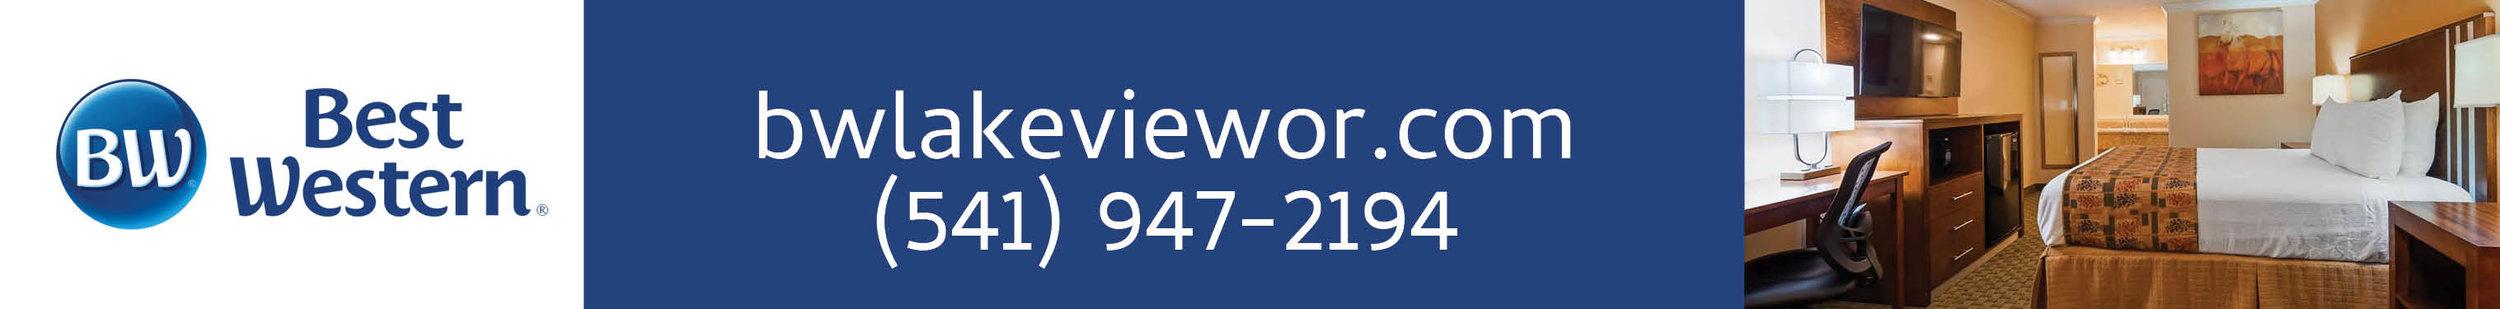 Best Western_Directory Cover-.jpg